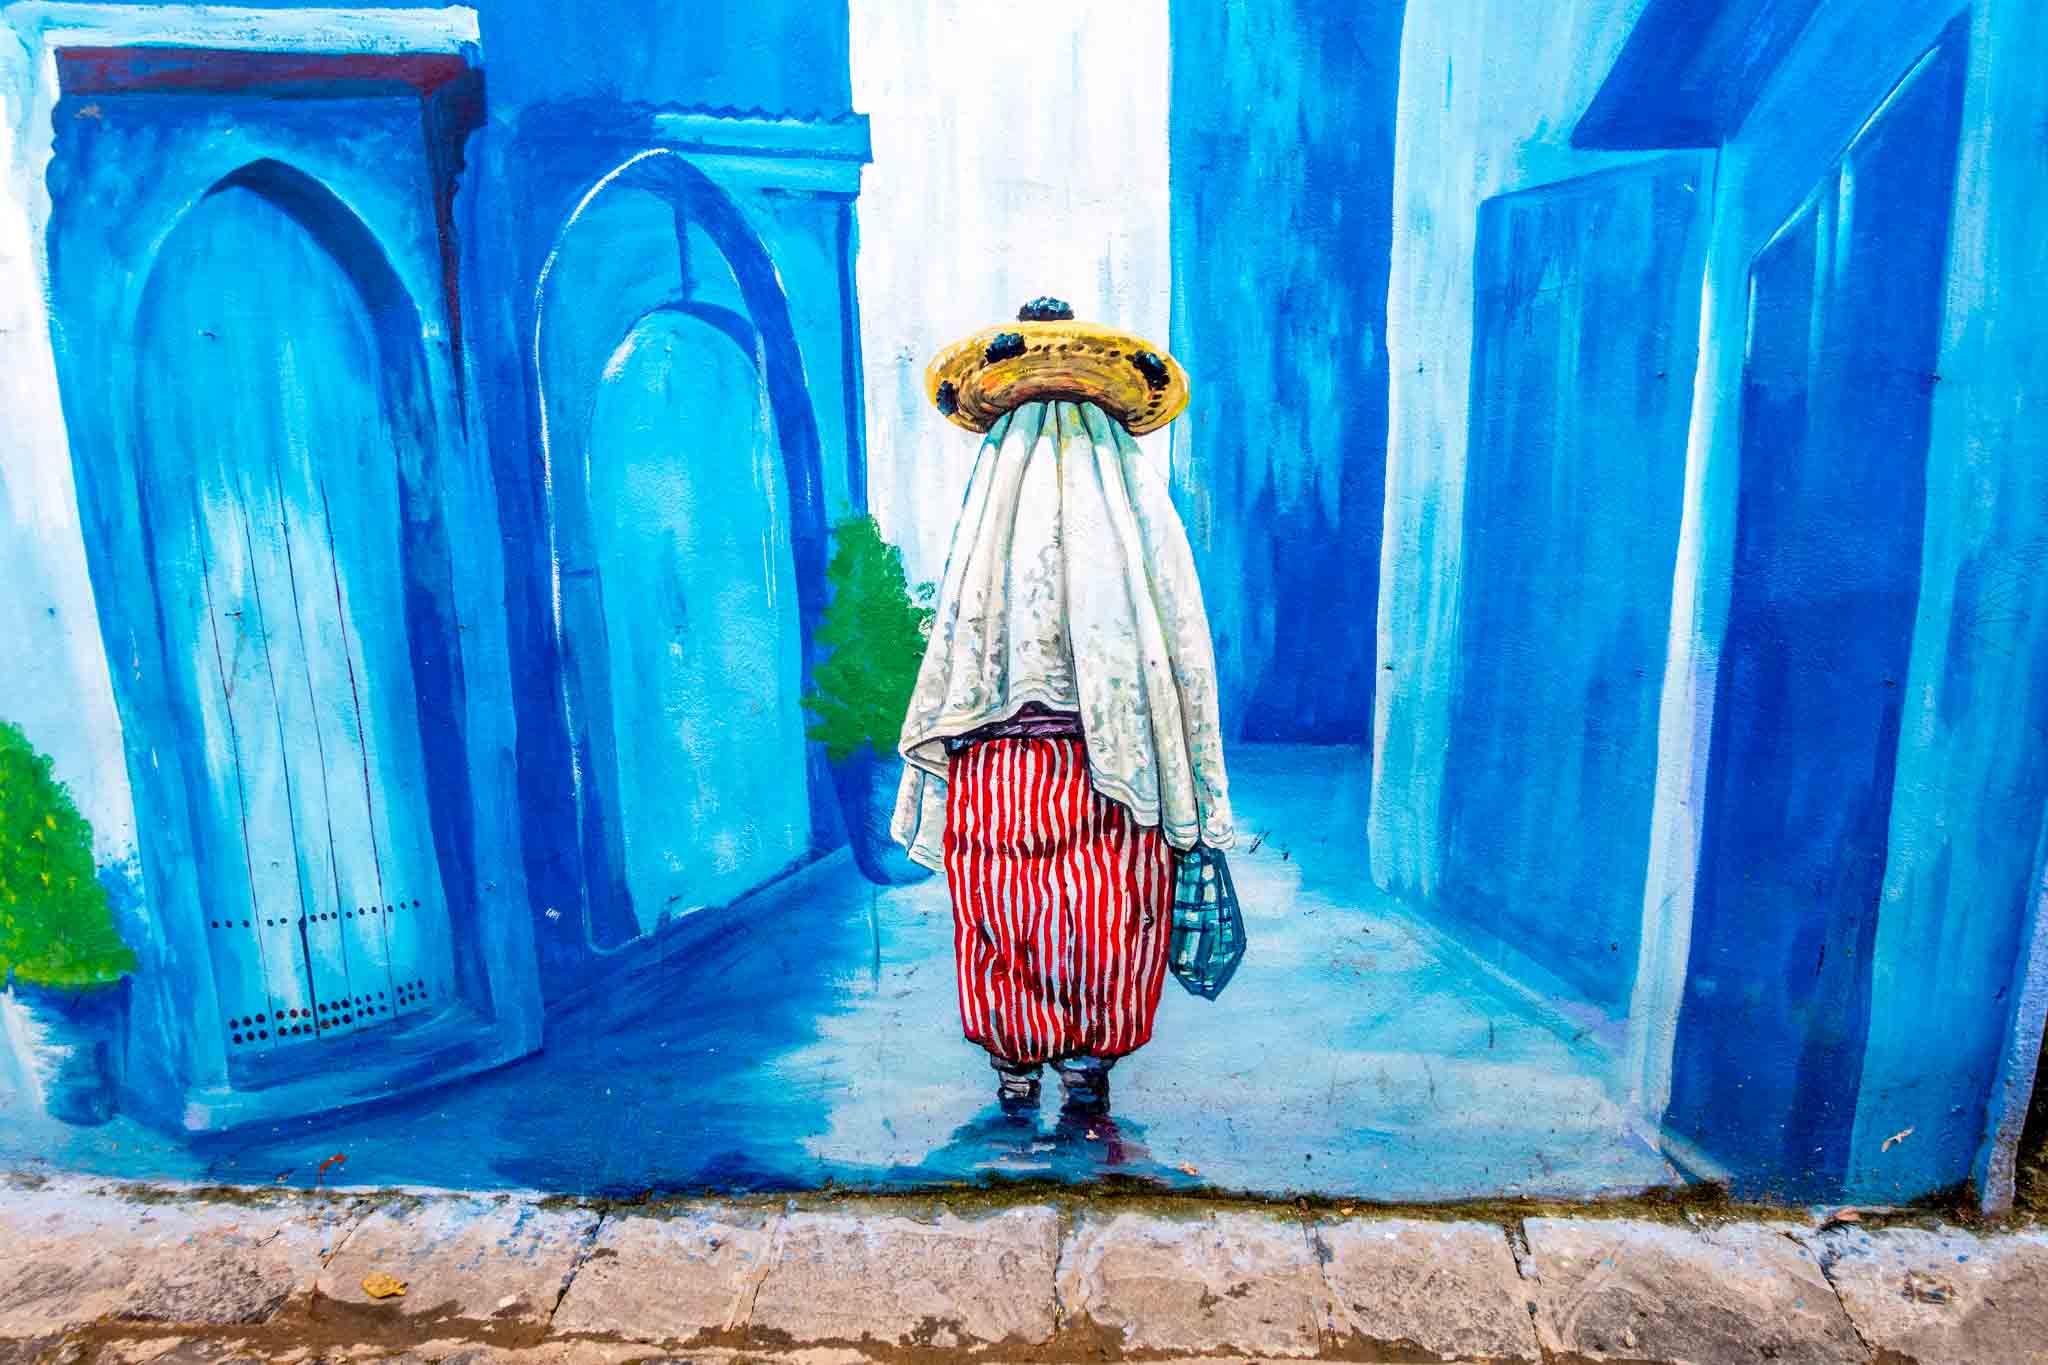 Street art mural of veiled woman